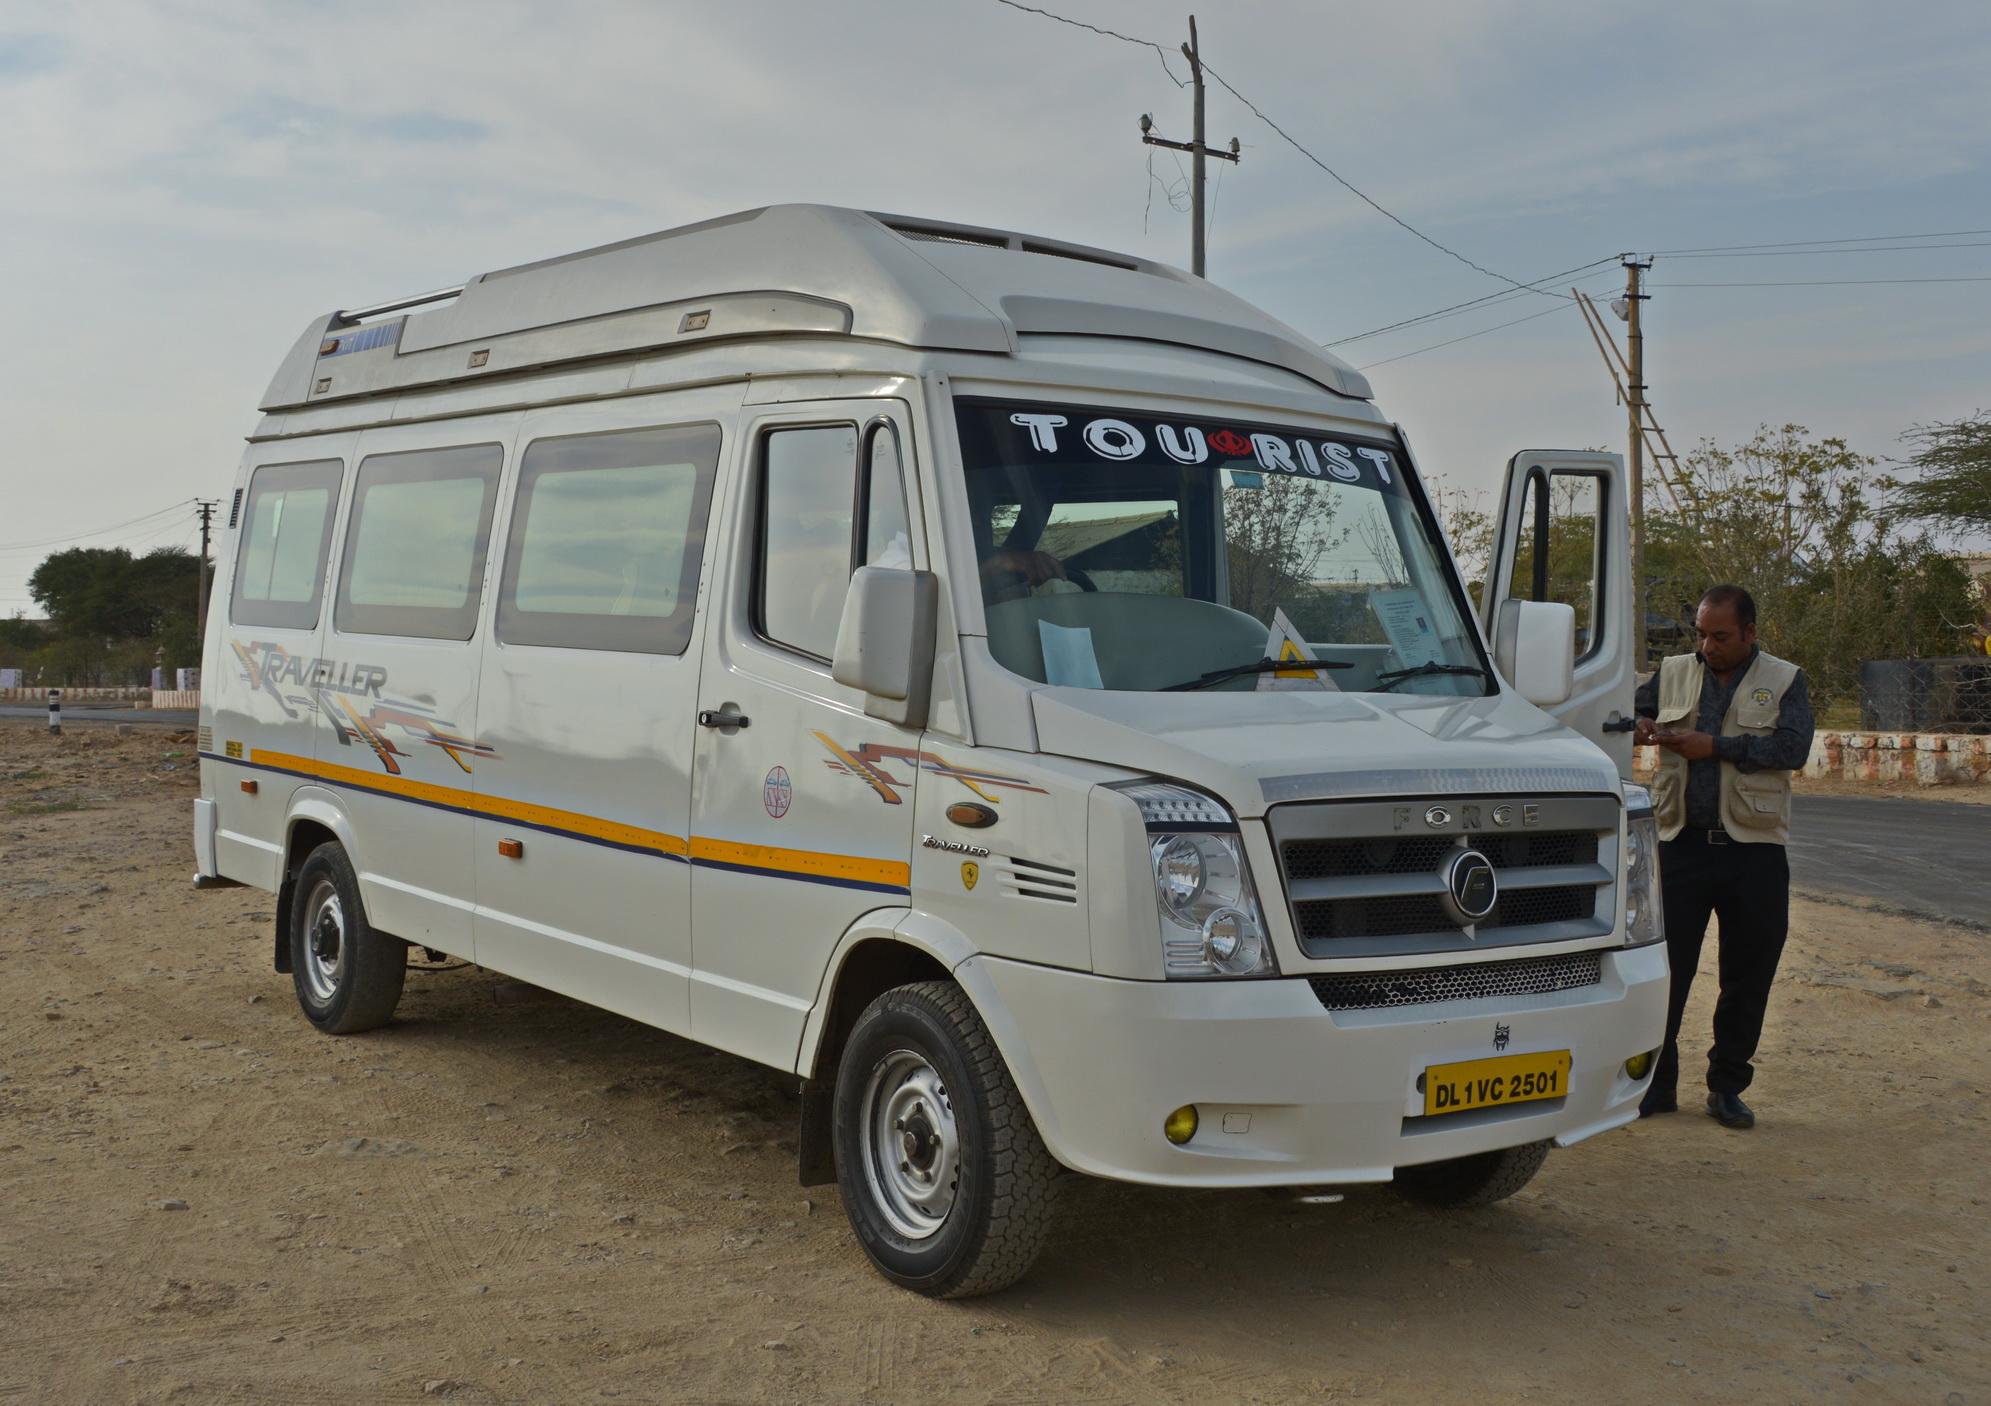 A Jaisalmer NIK_0769